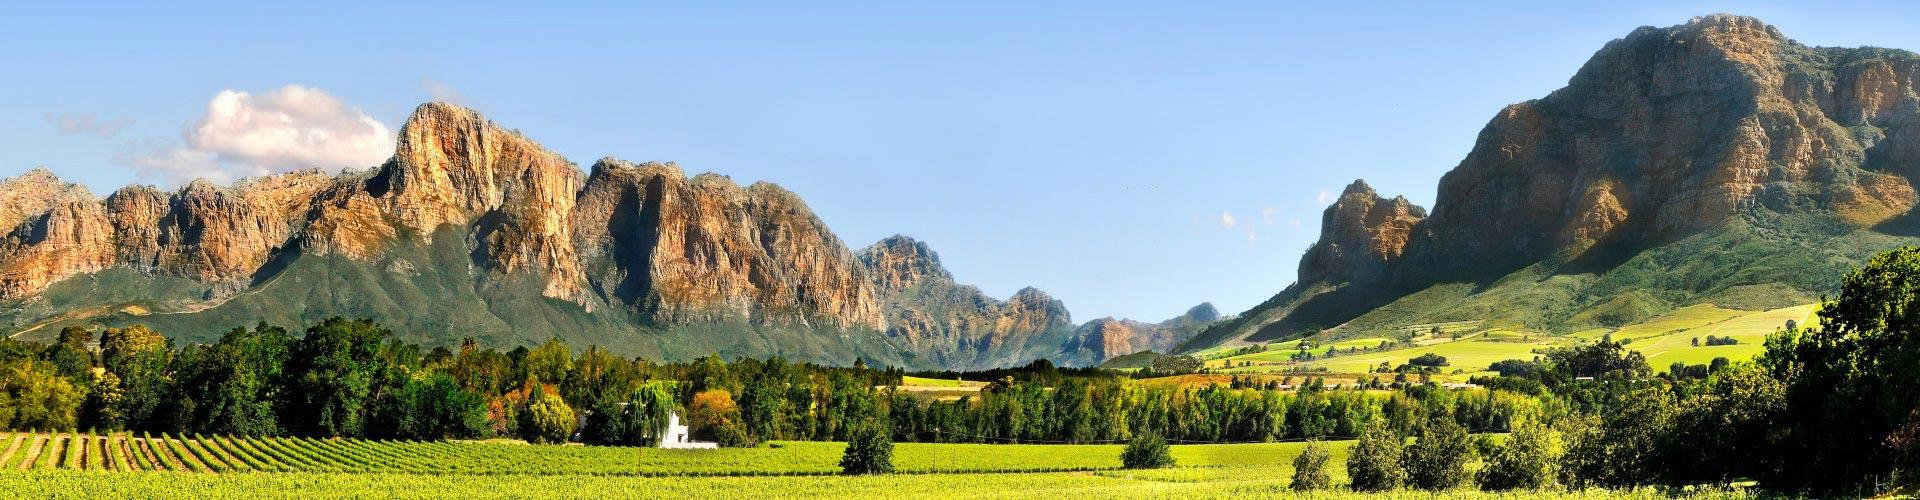 vredelust-minnegoedwines-minnegoed-wijnen-zuidafrika